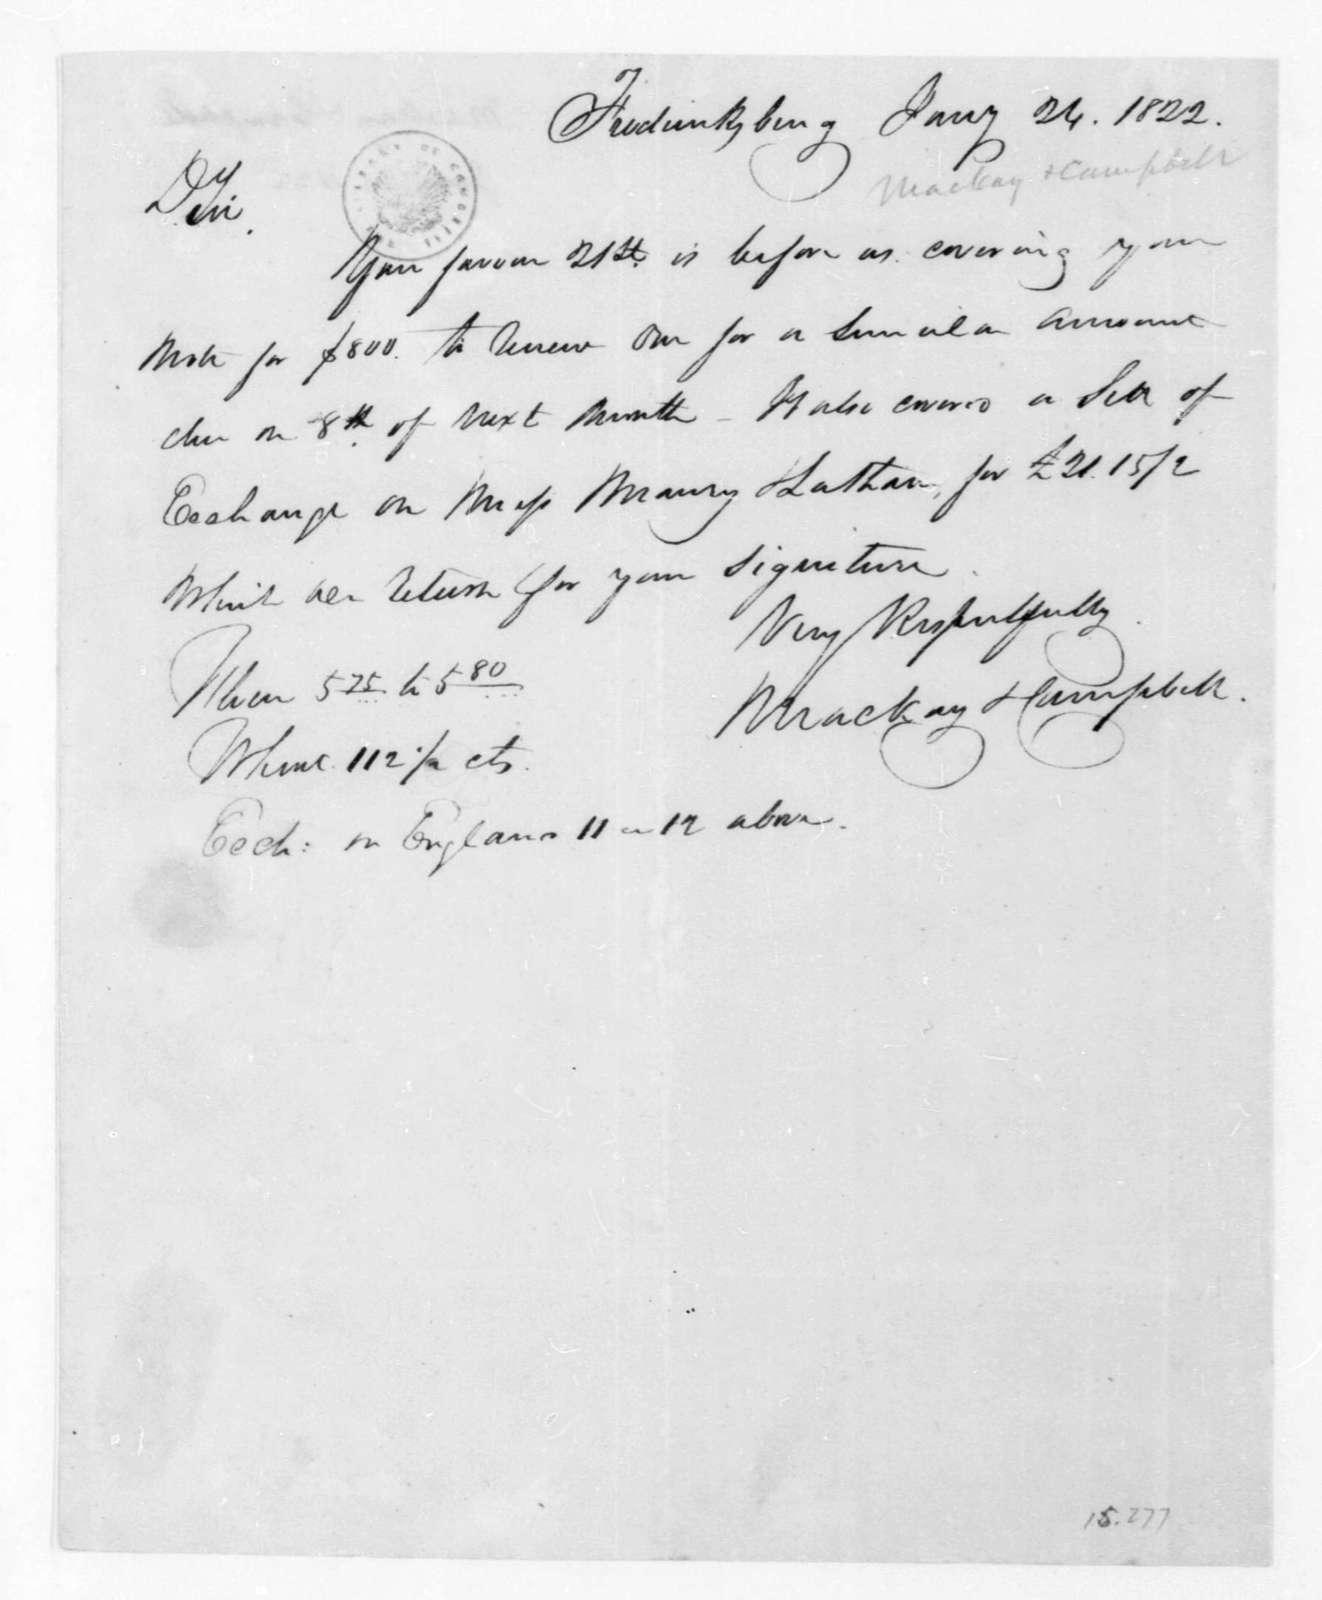 MacKay & Campbell to James Madison, January 24, 1822.